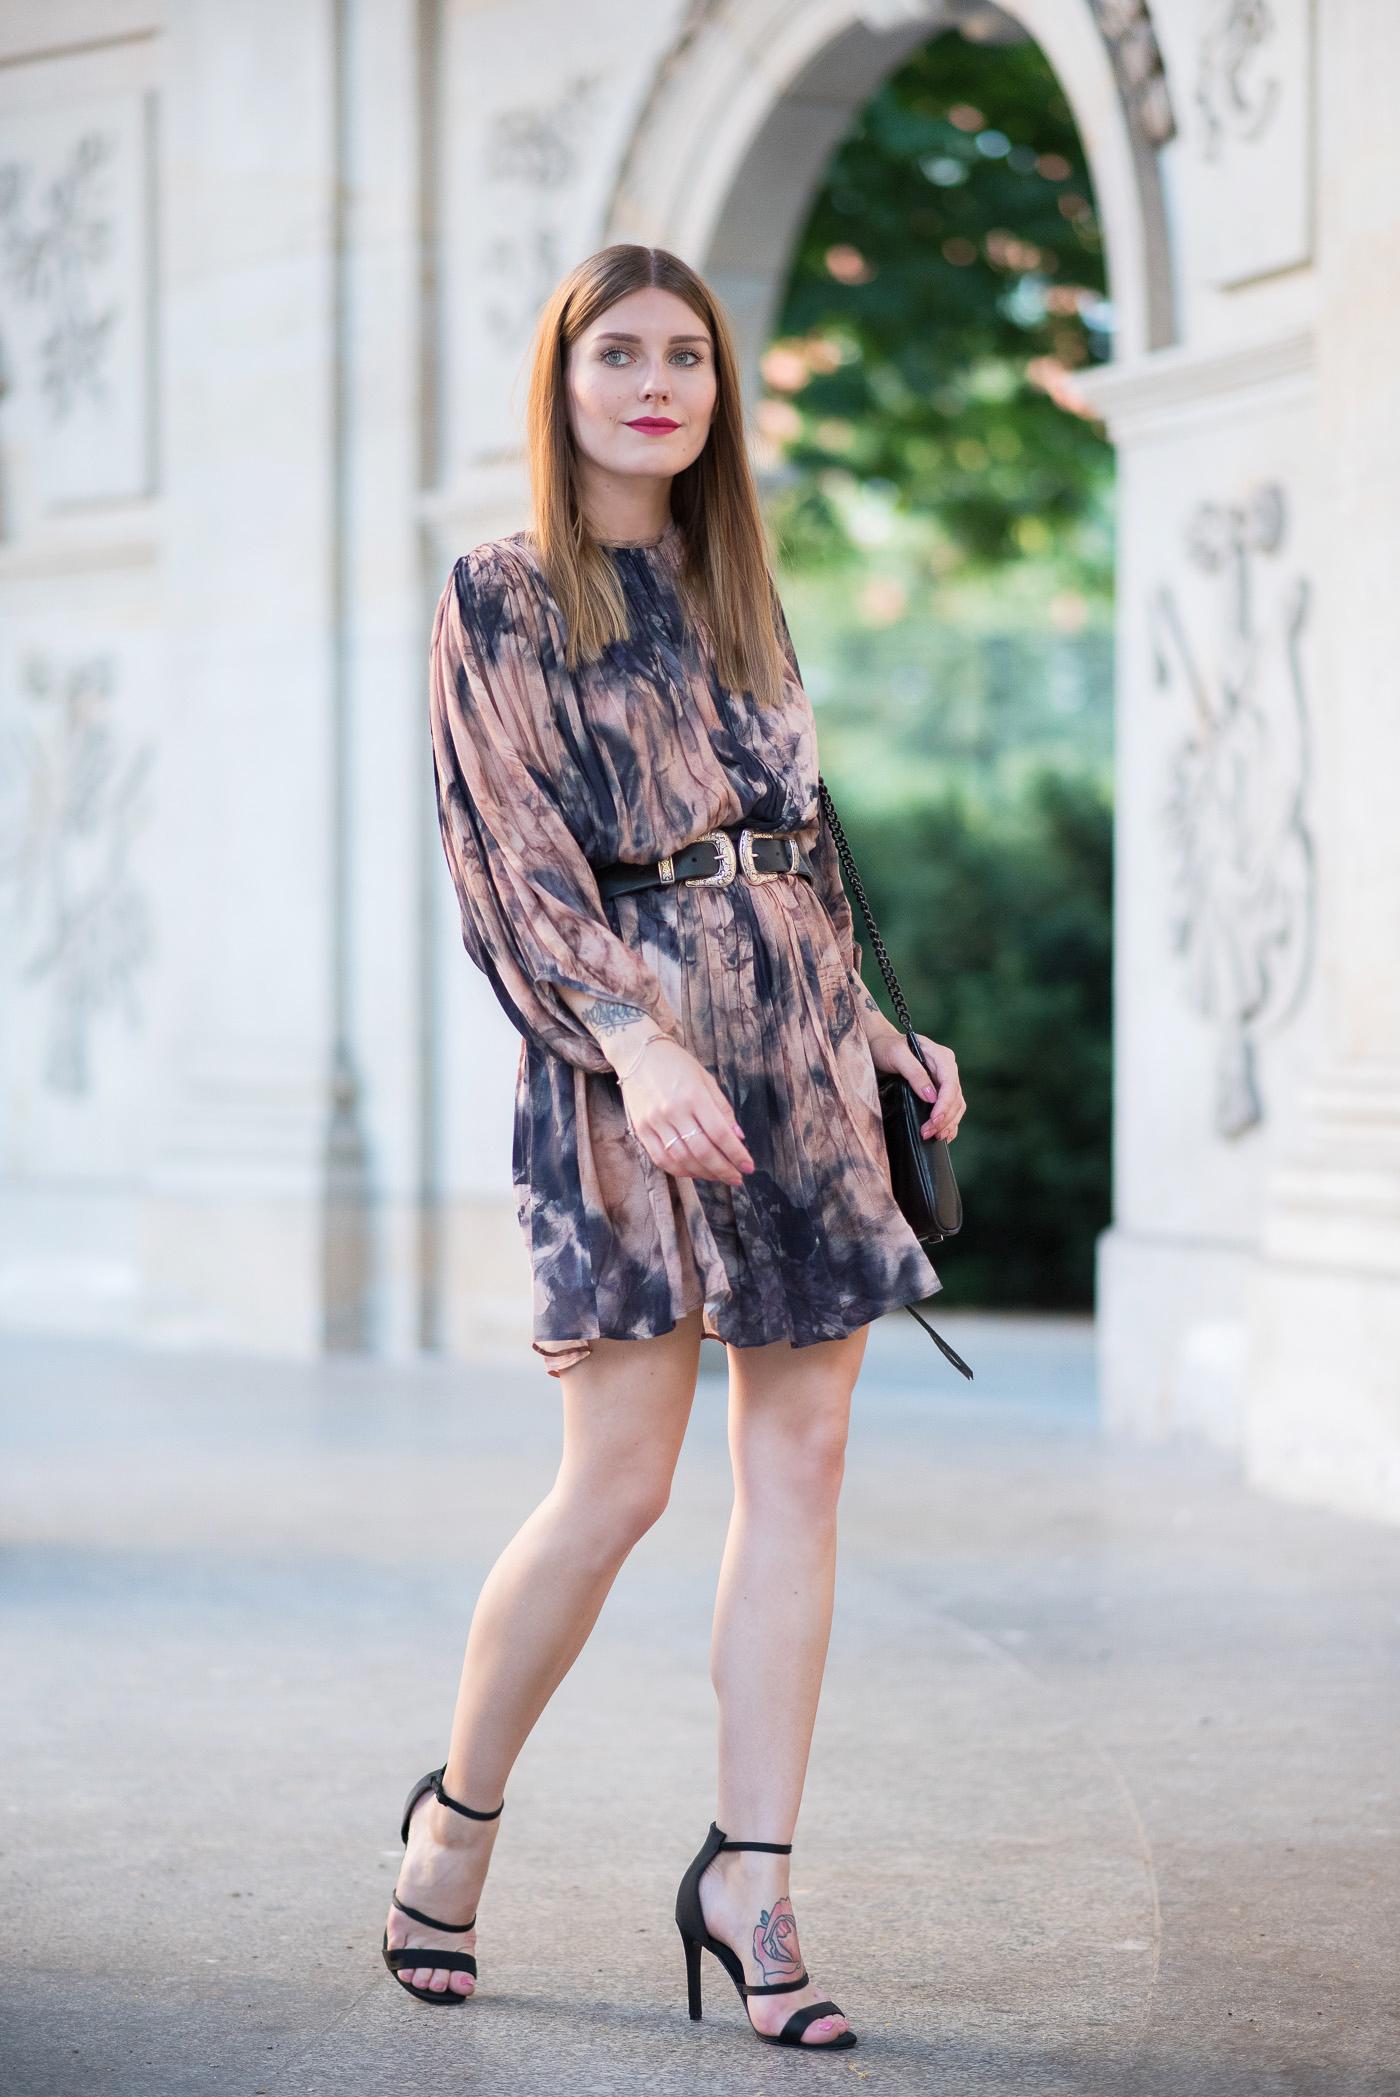 Berlin_Fashion_Week_Ready_Outfit_1